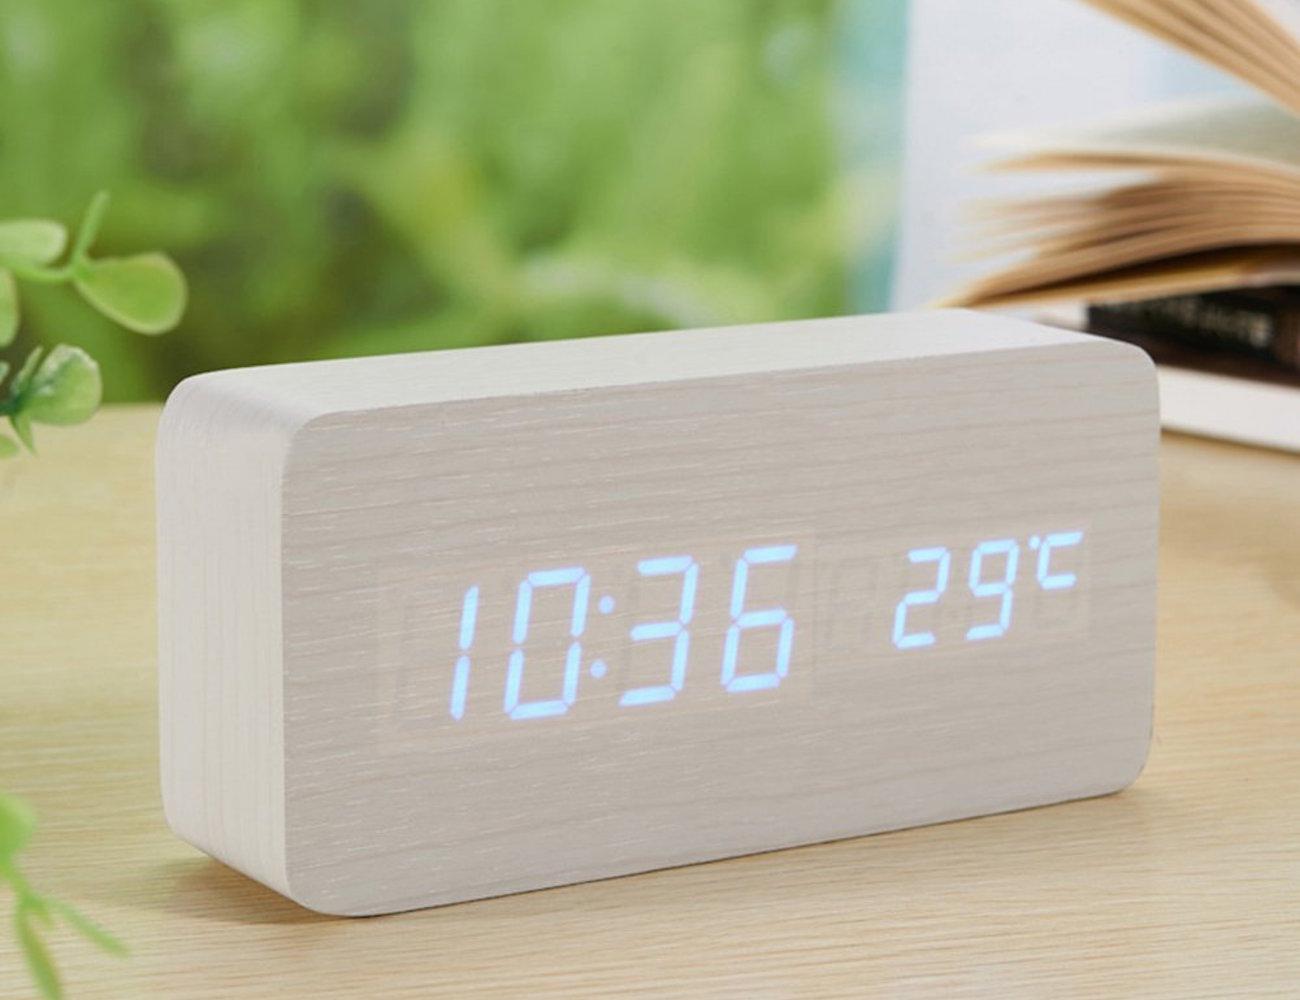 sea-team-wood-imitation-electronic-desk-clock-03